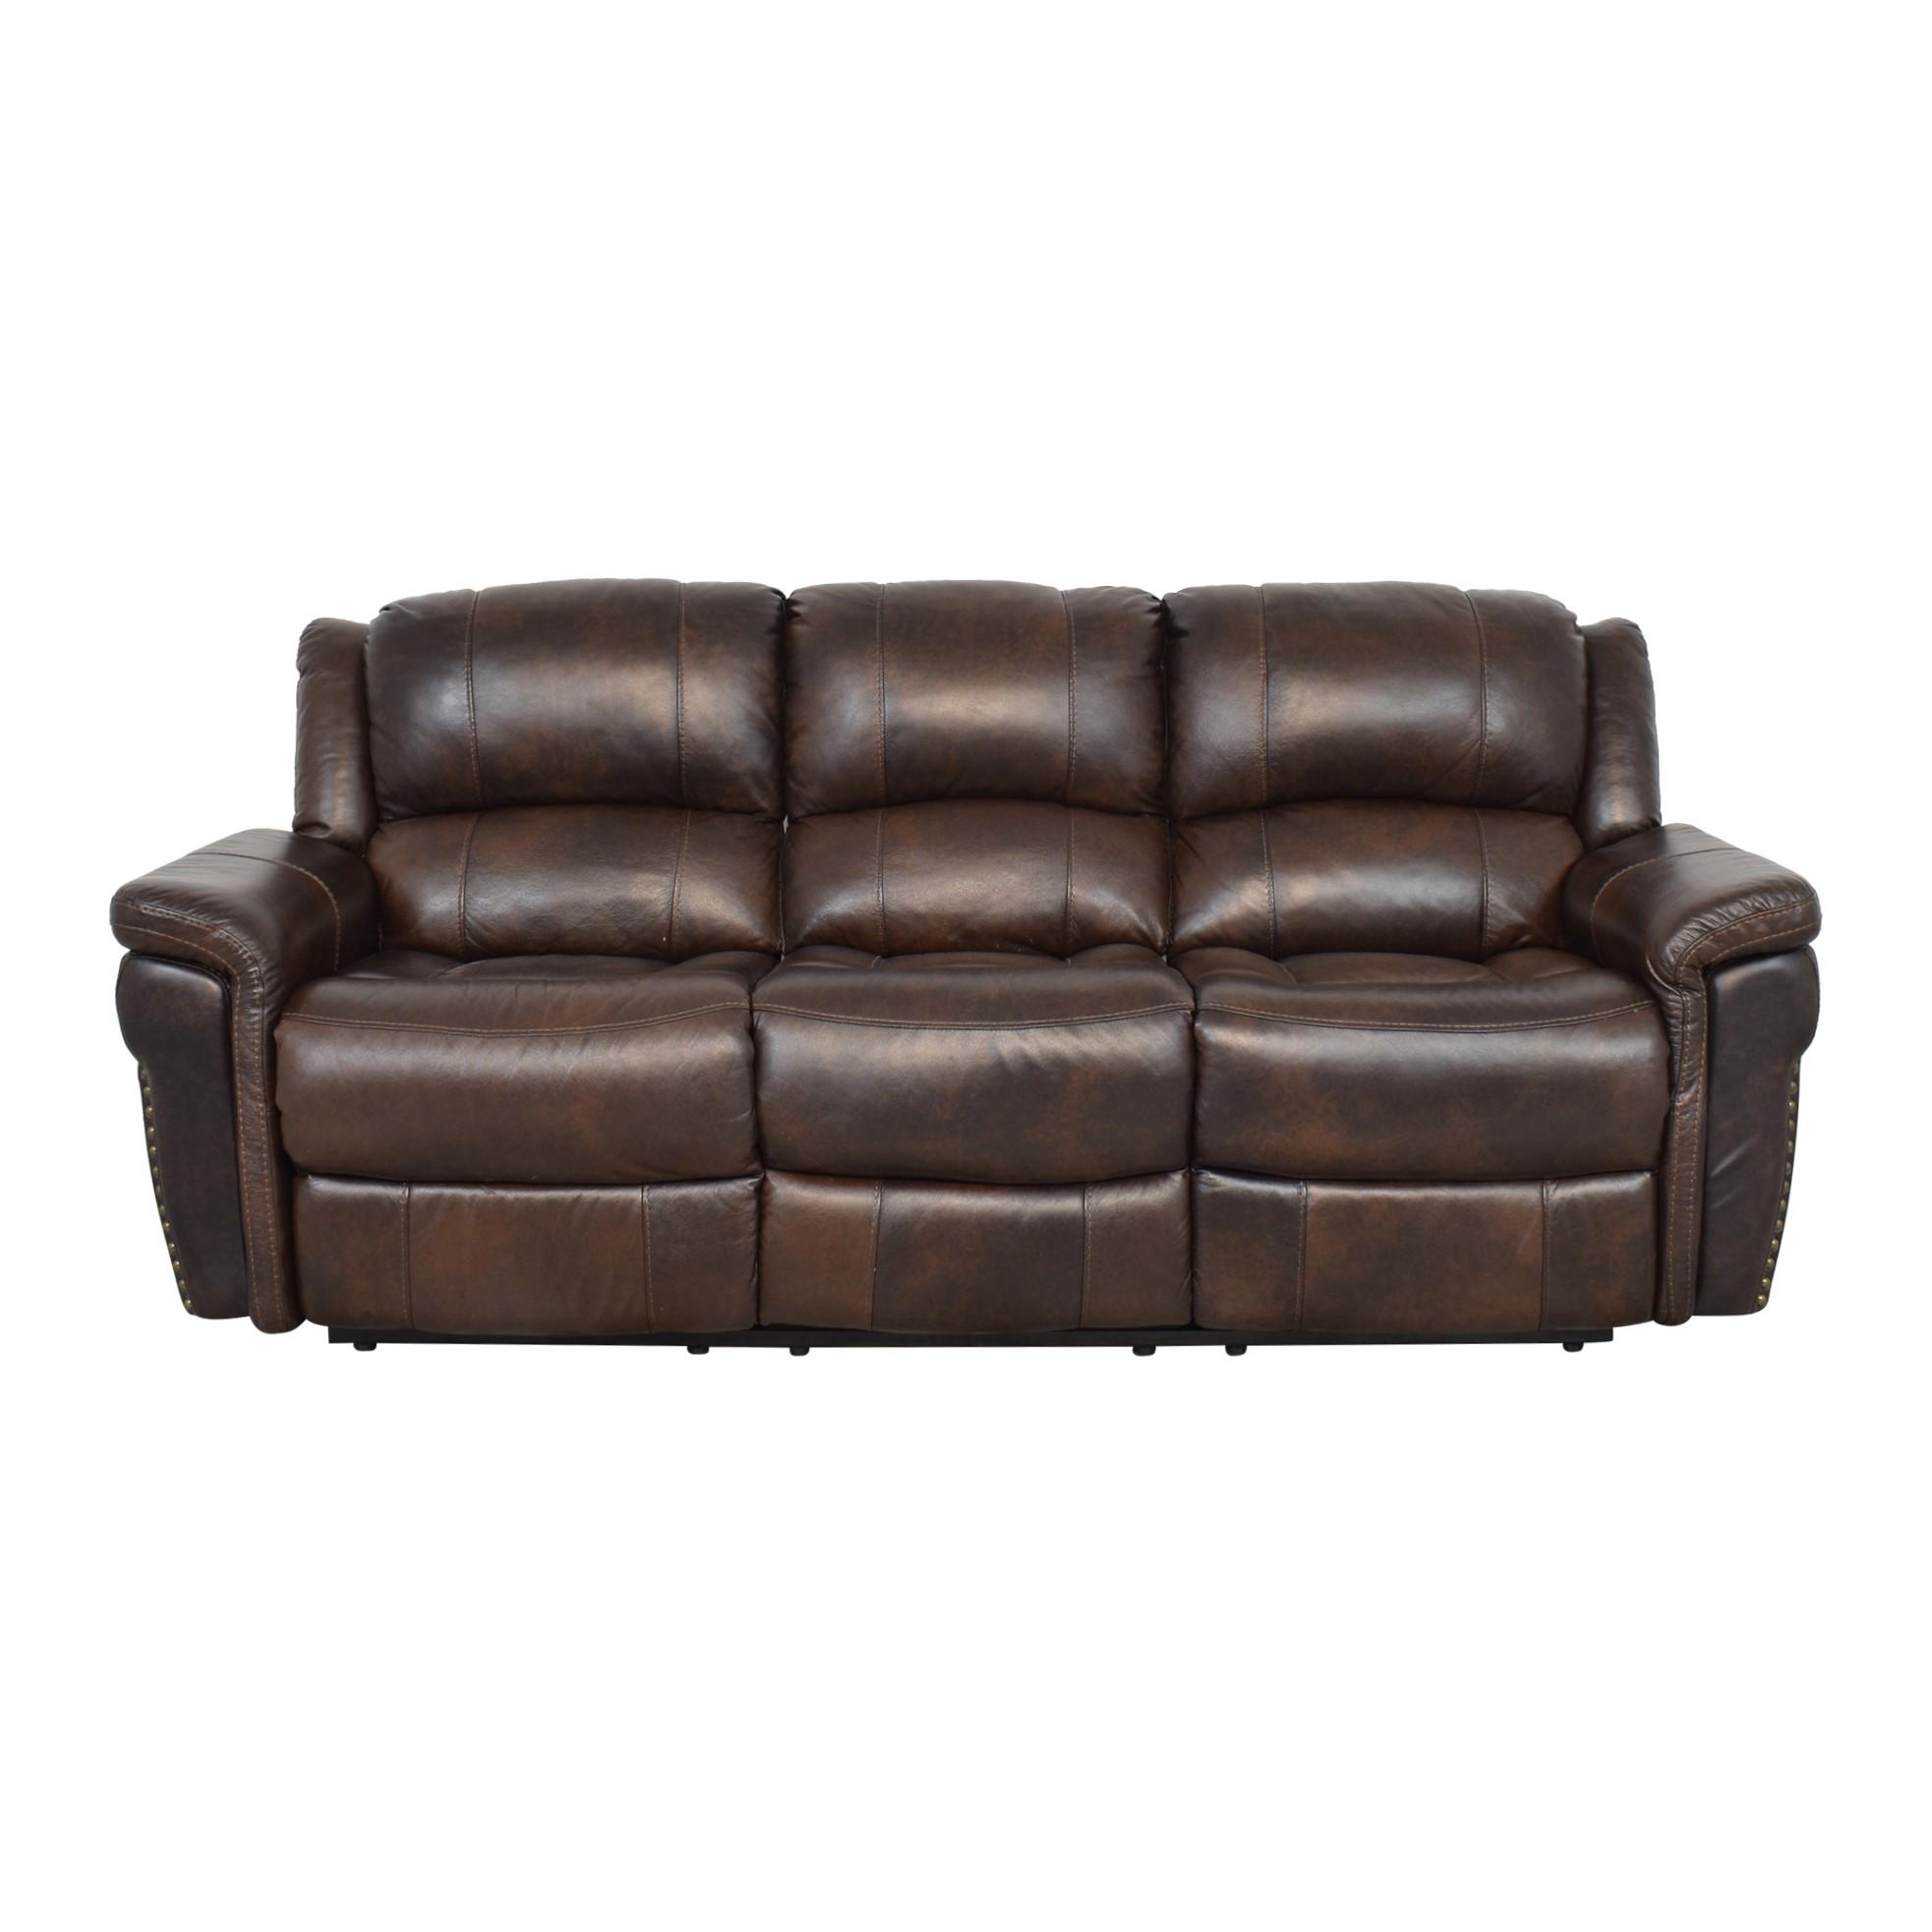 buy Delancey Street Furniture Recliner Sofa